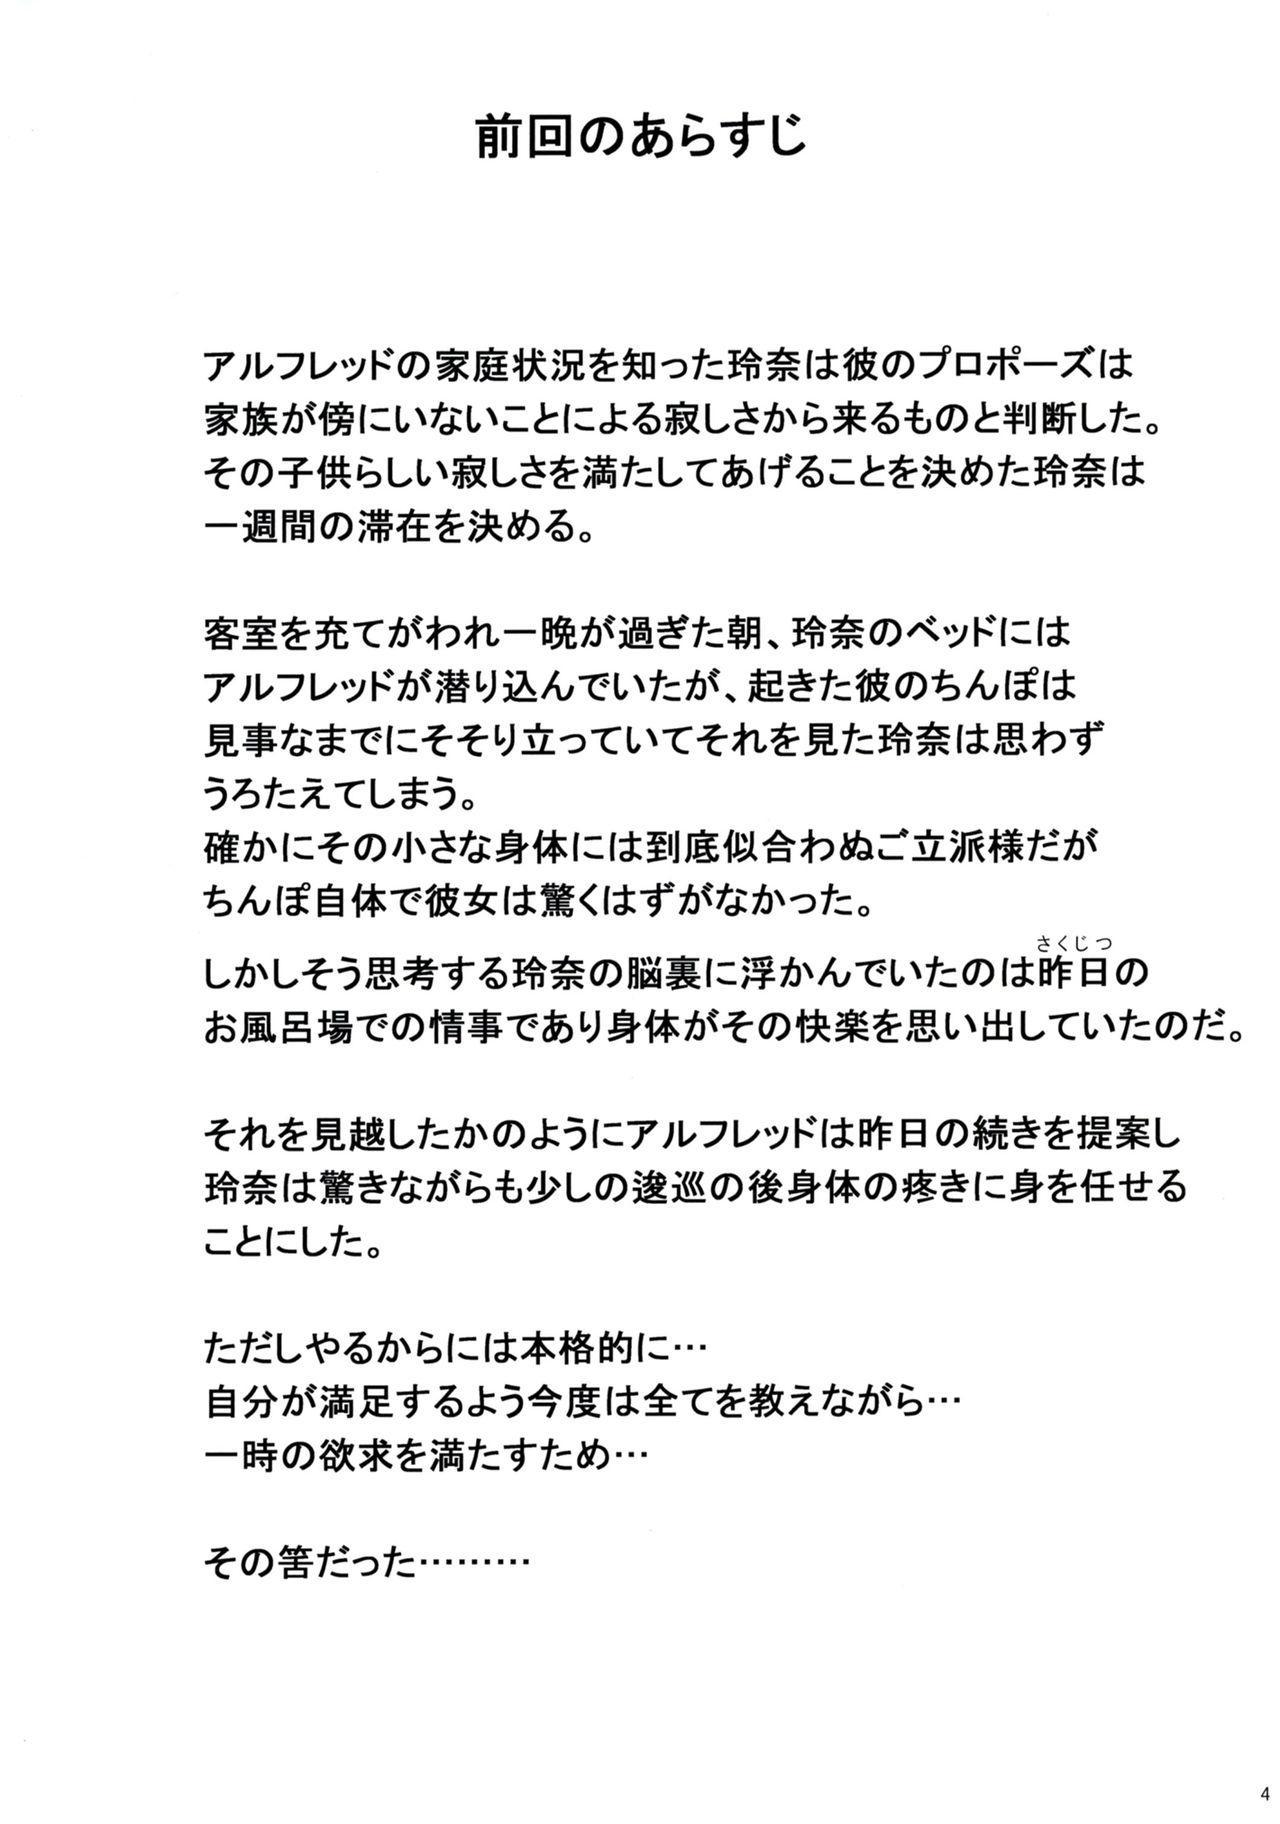 Gal Shota Cinderella 4 2